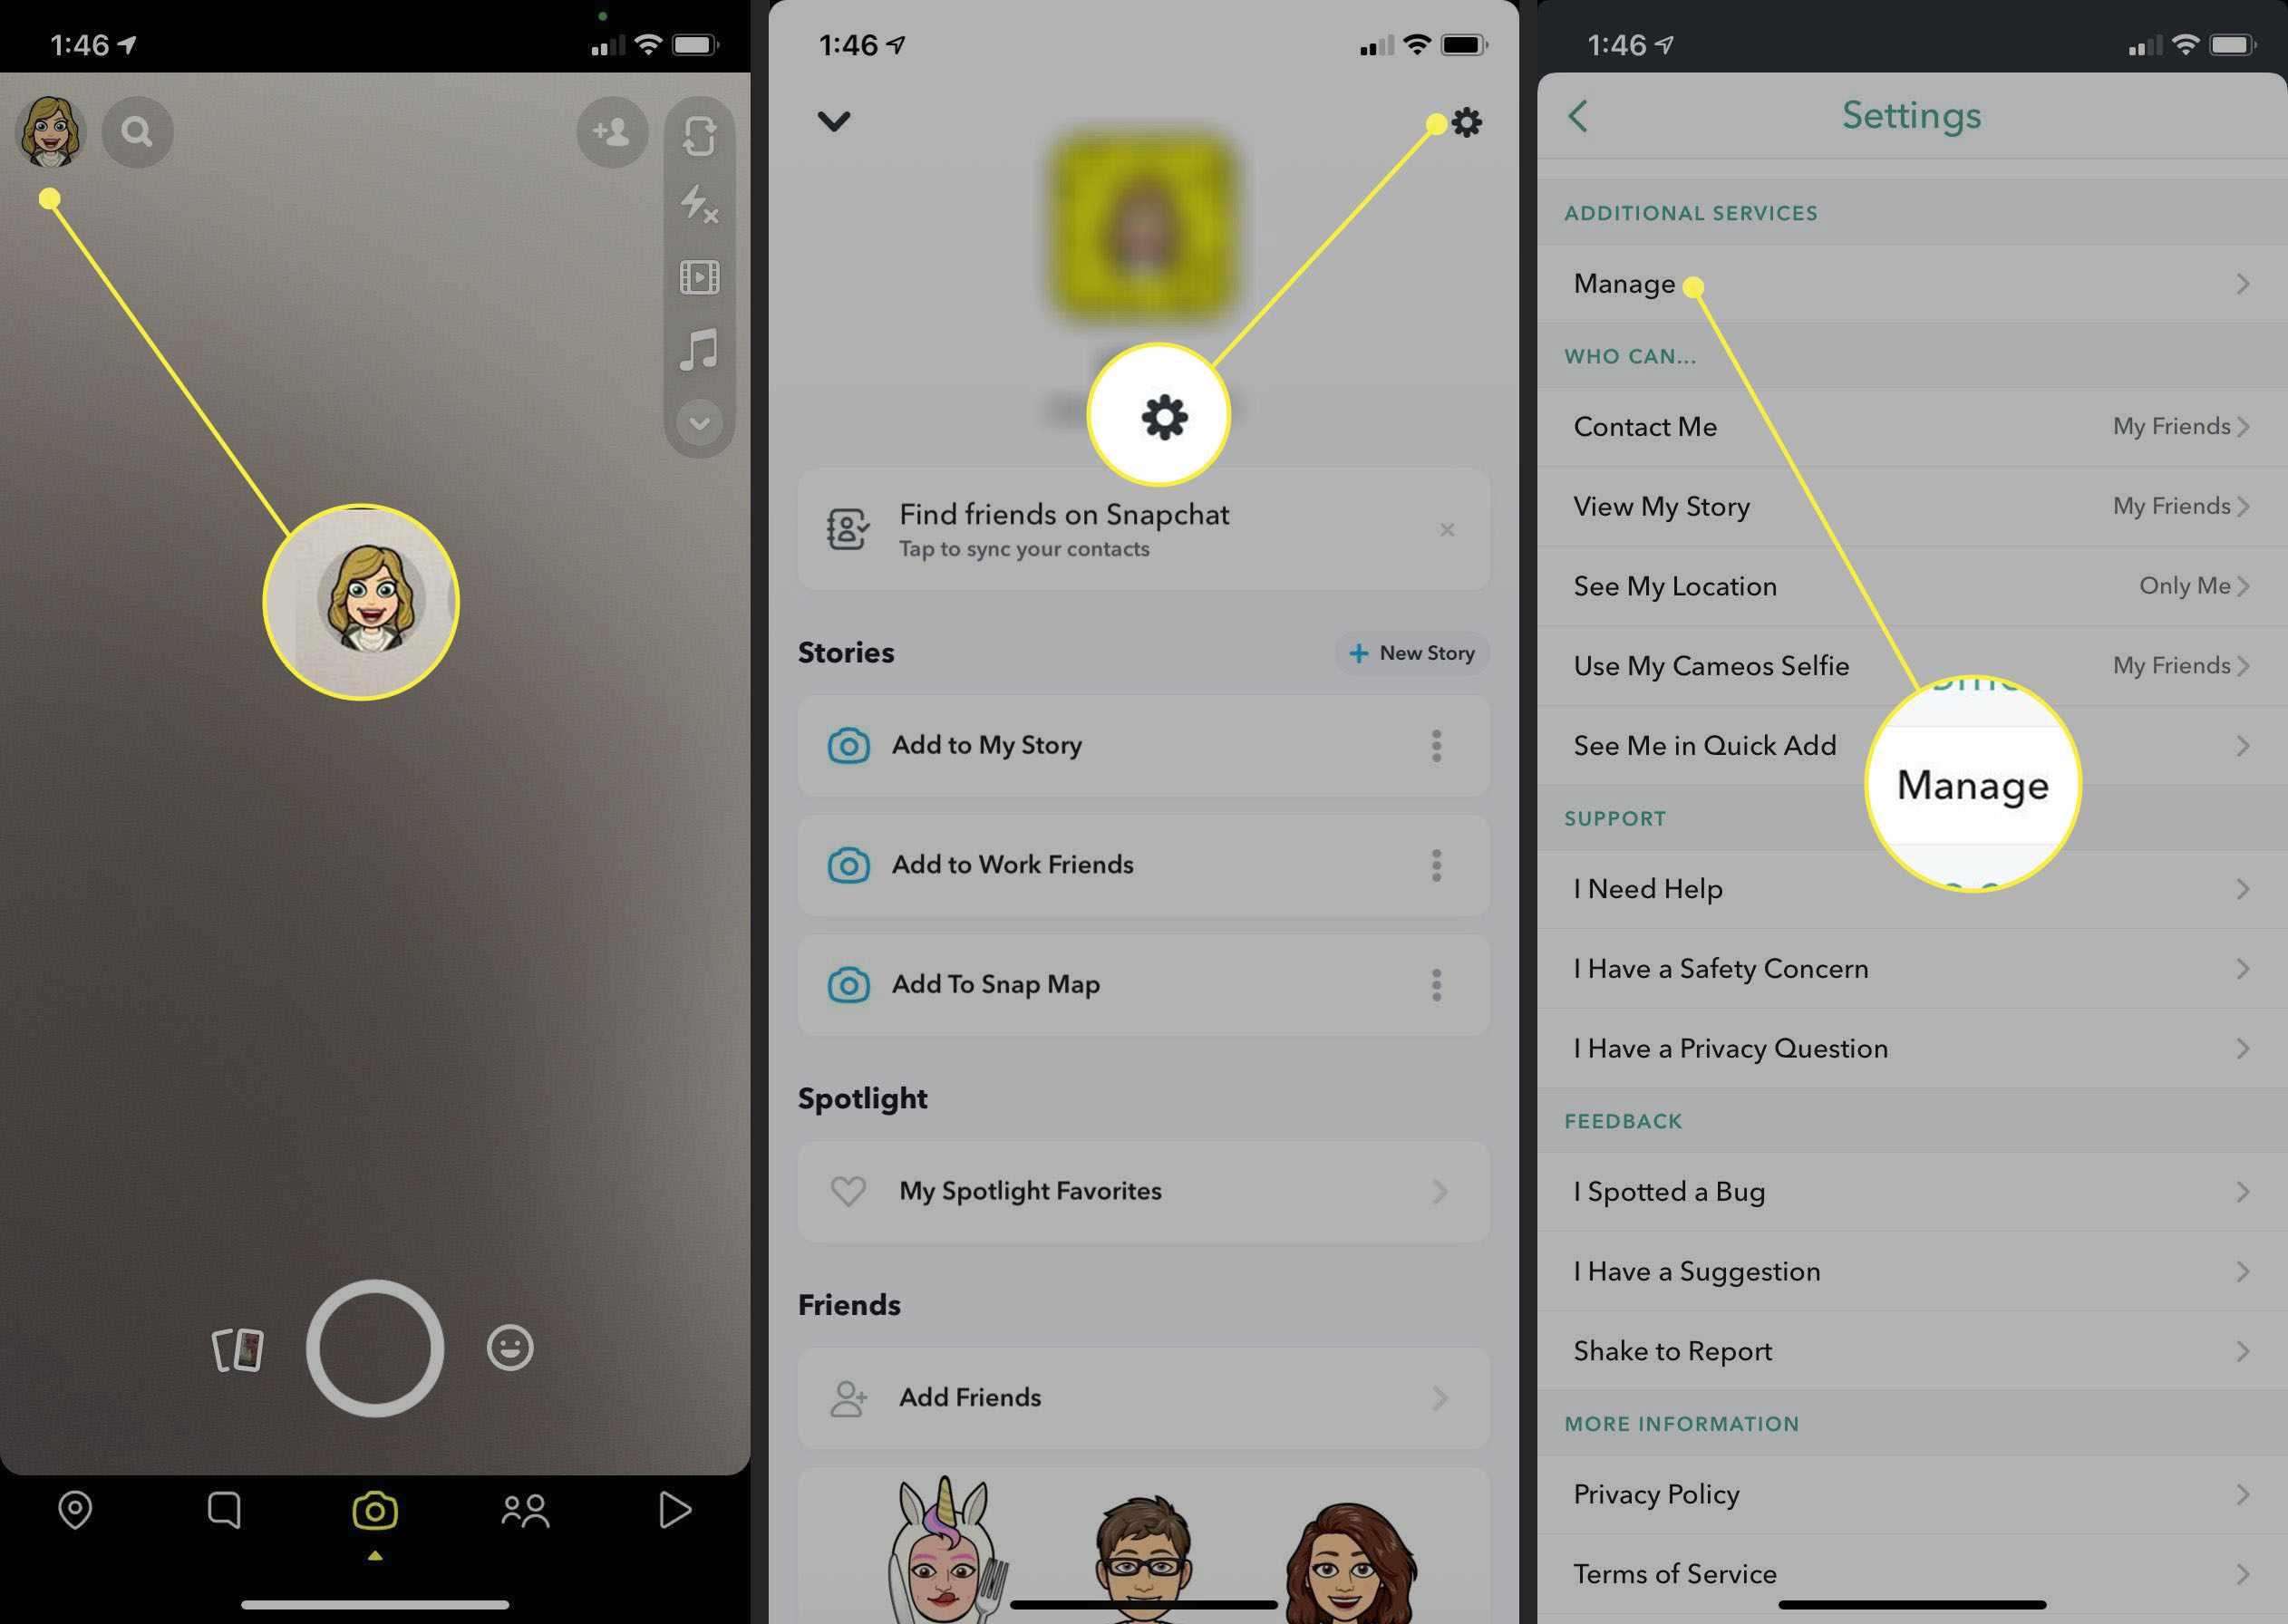 Steps to change emoji in conversation on Snapchat.